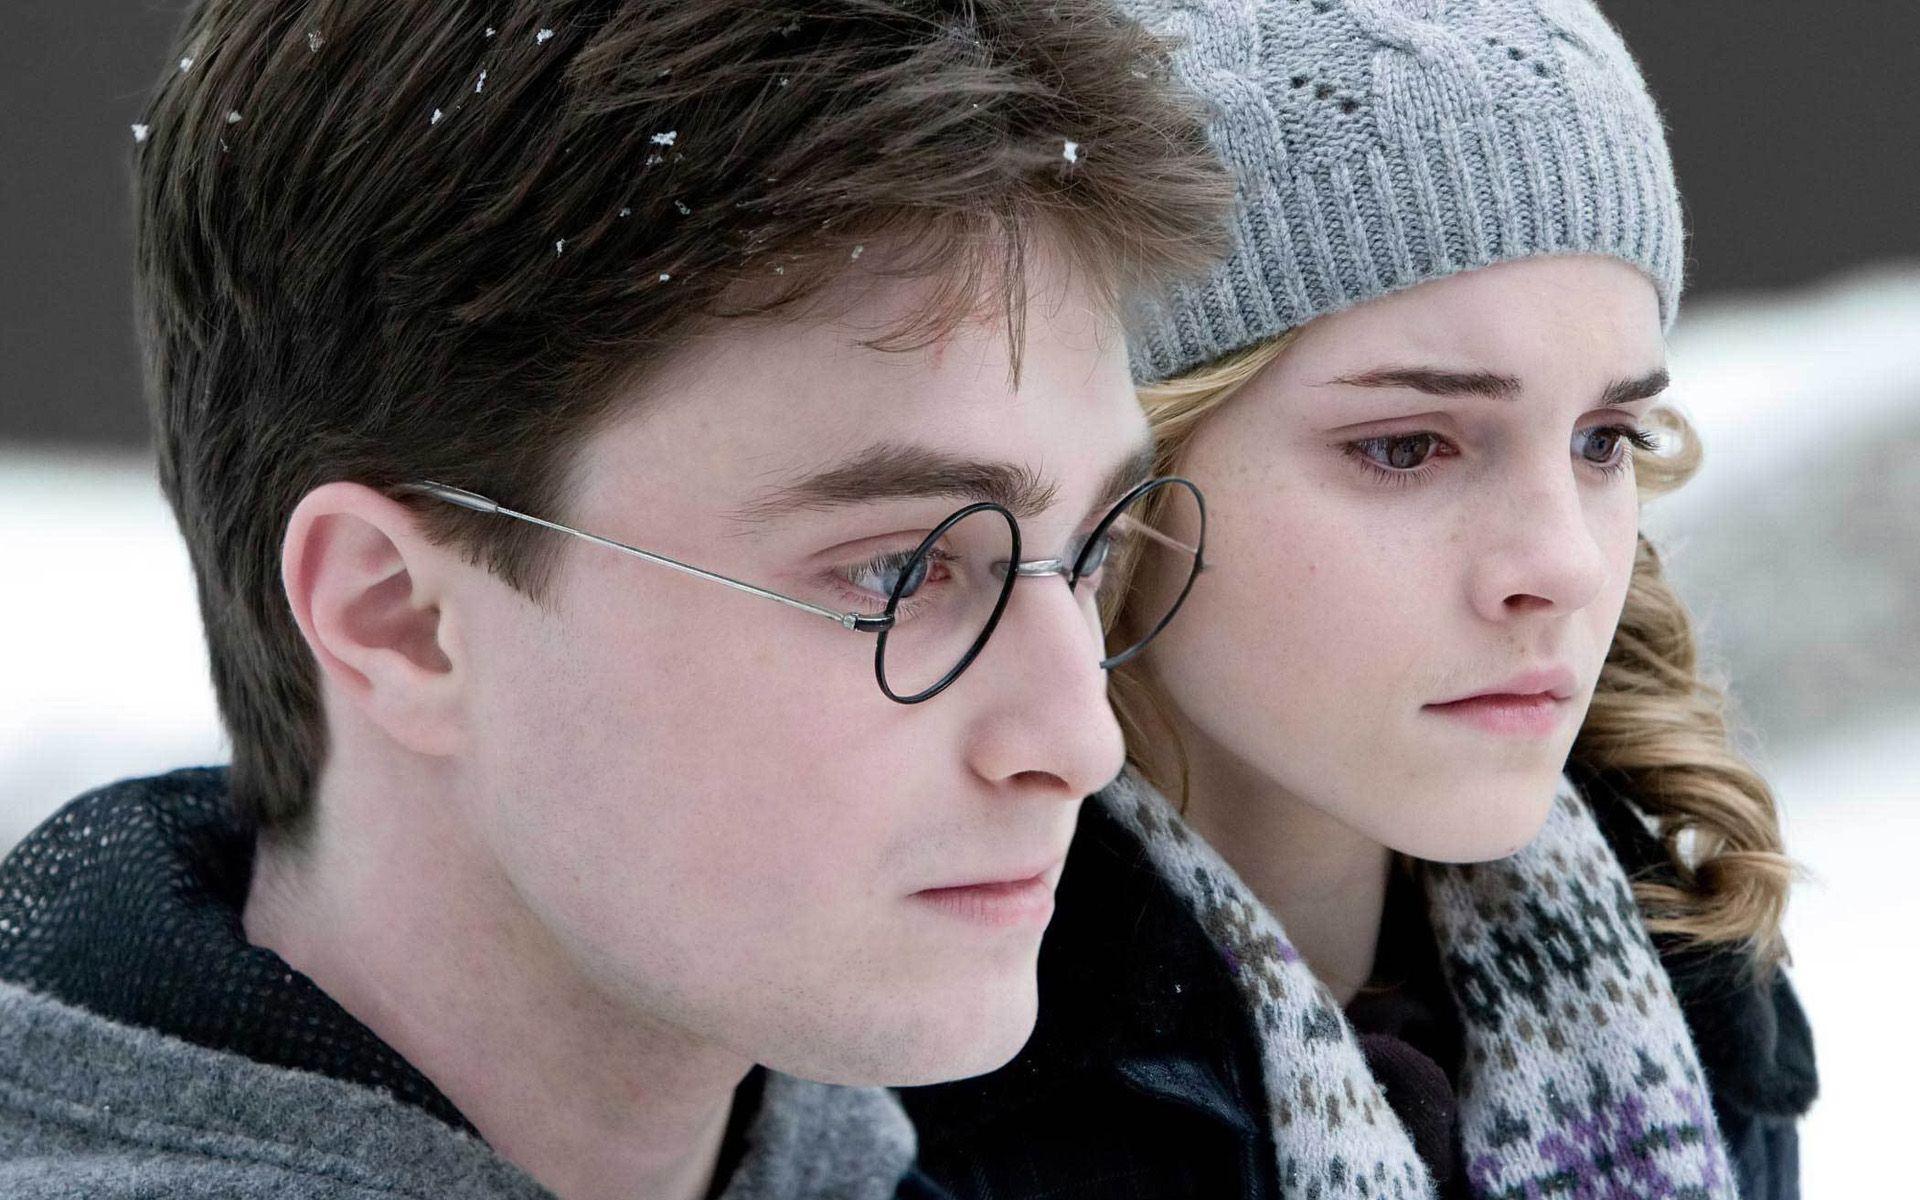 Гарри Поттер и Гермиона Грейнджер | Гарри поттер, Гарри ...